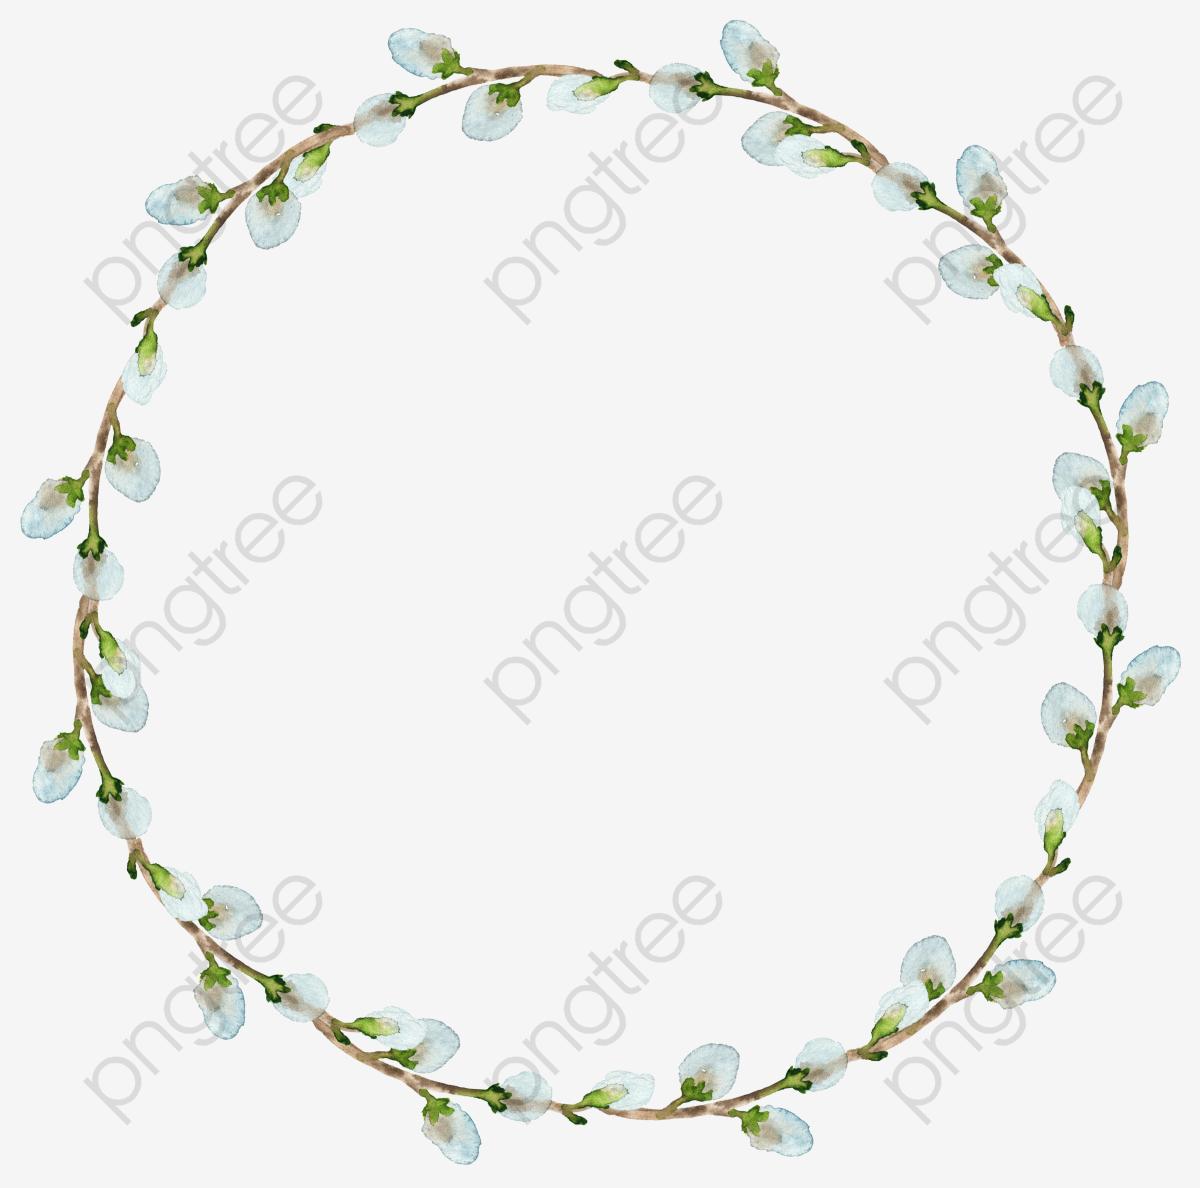 White Flower Wreath, Flower Clipart, Plant, Leaves PNG Transparent.